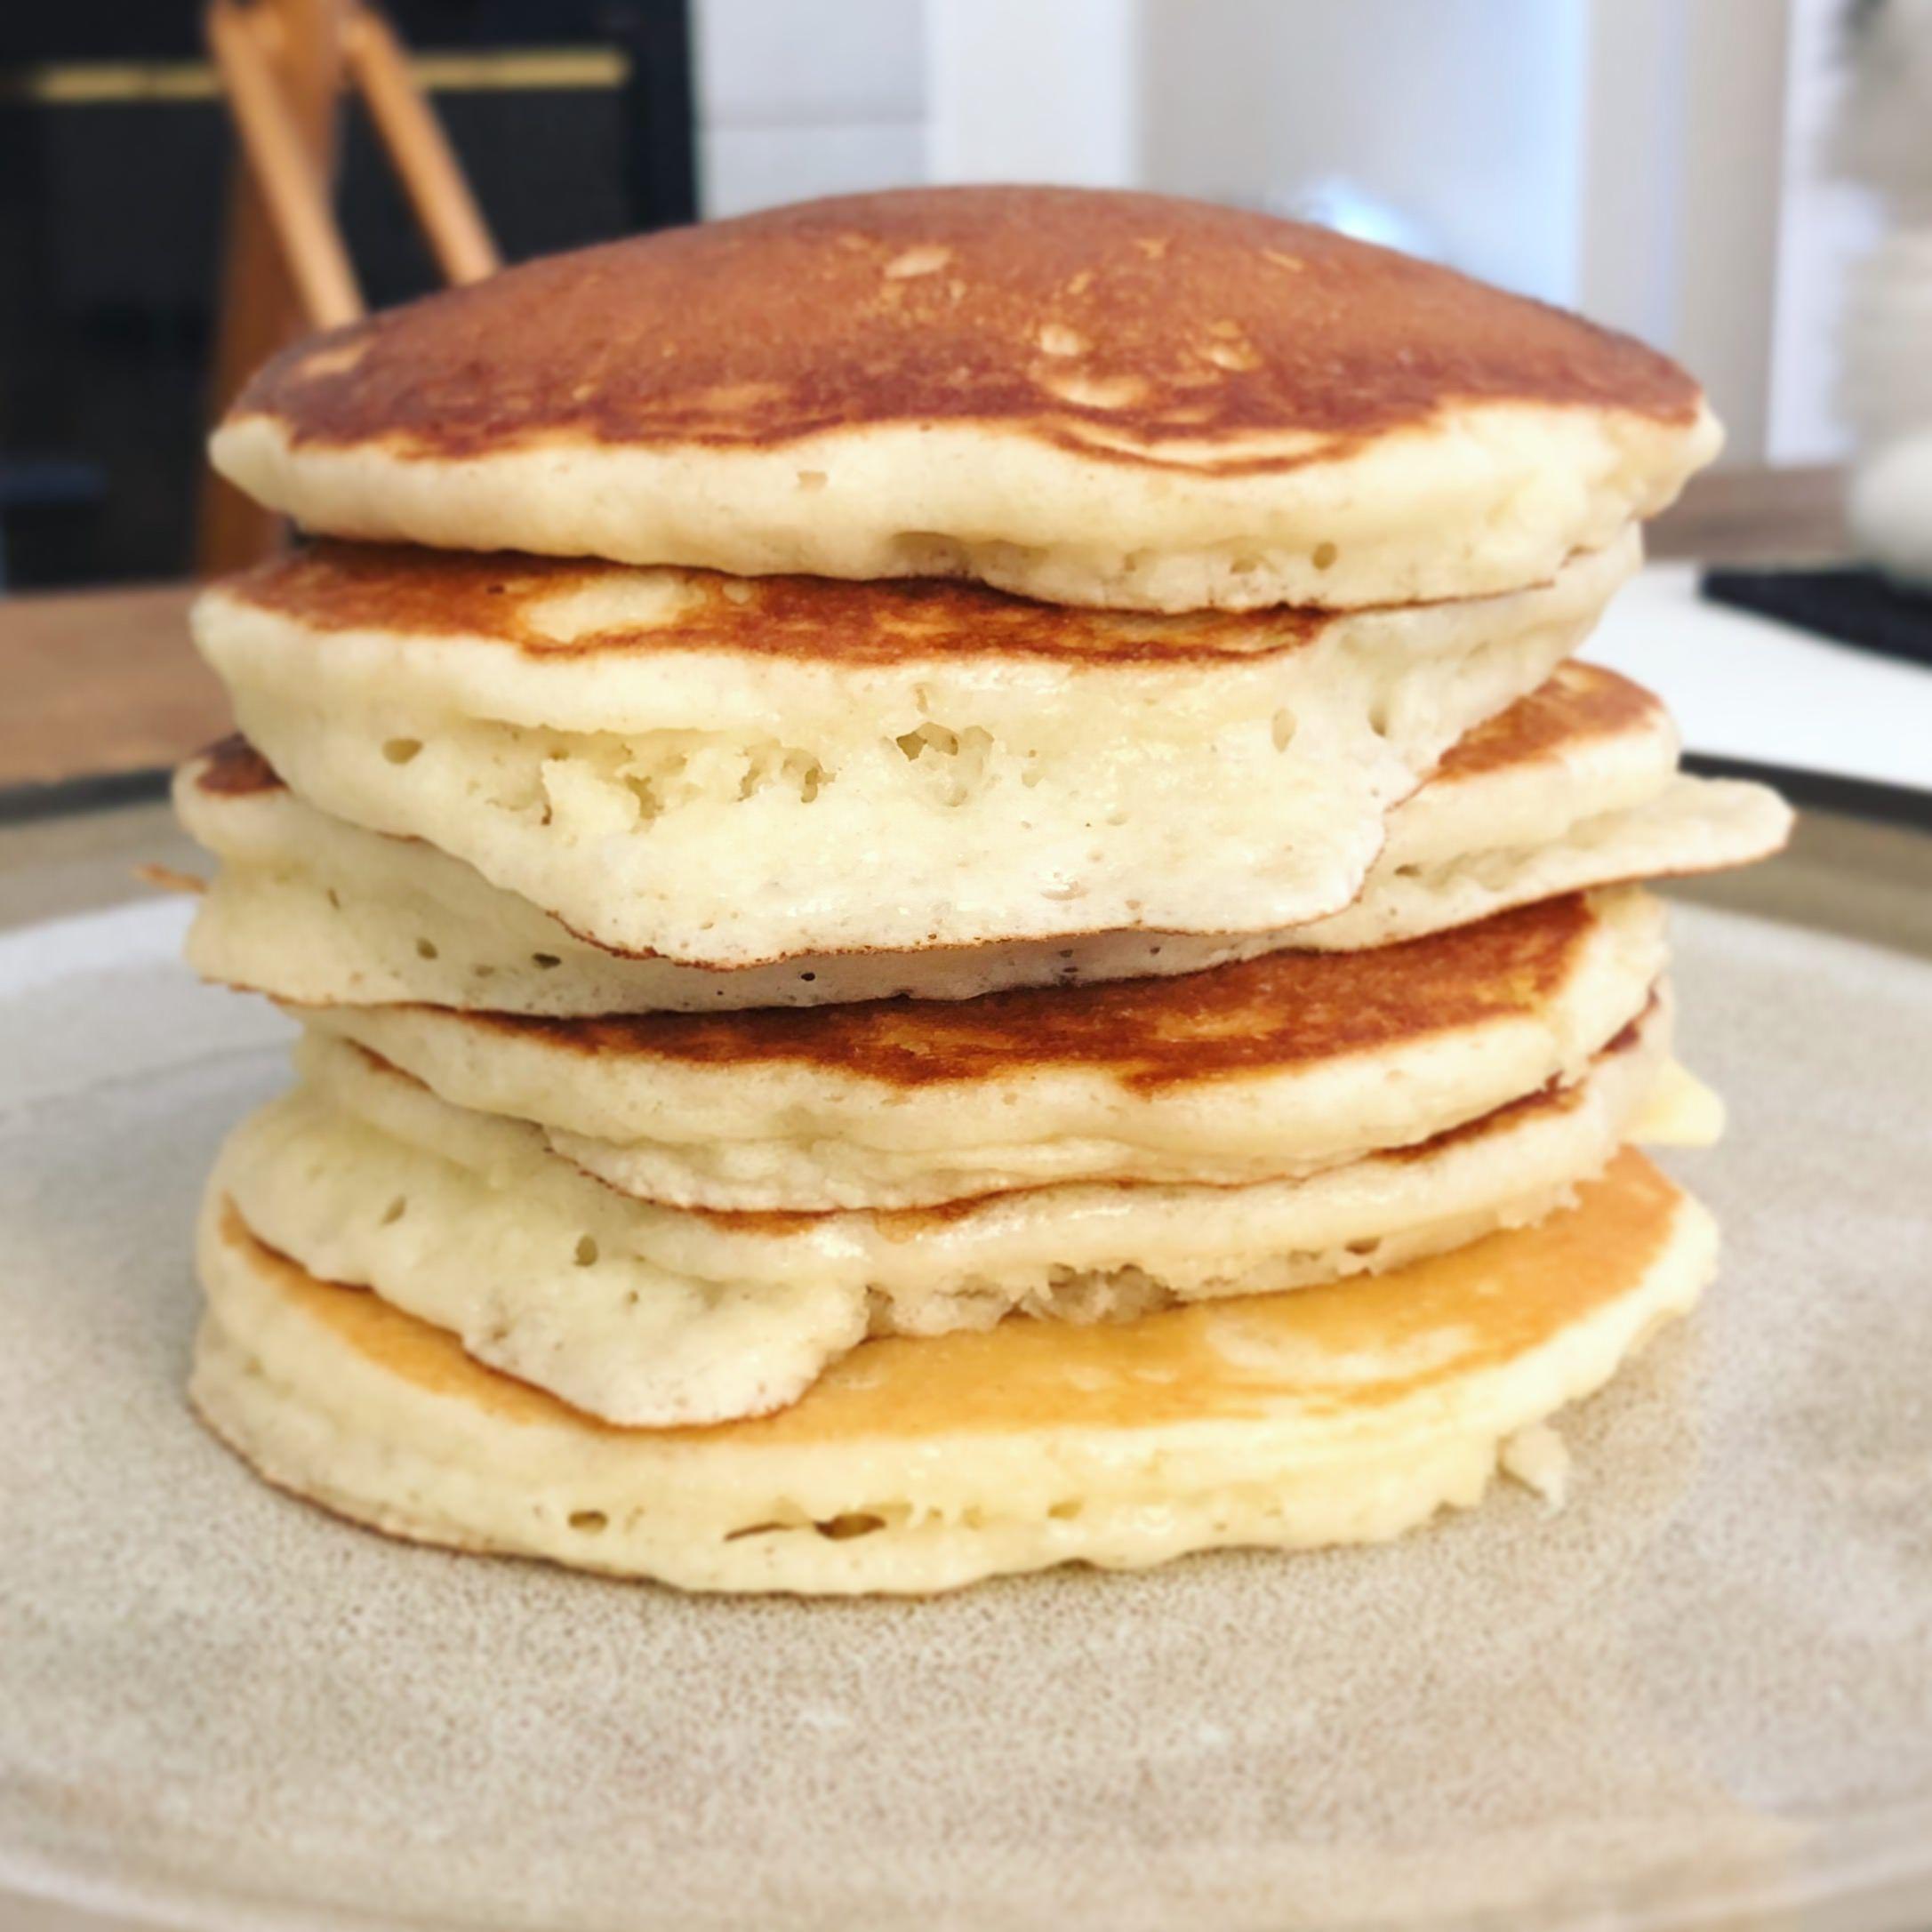 Homemade] Fluffy pancakes   yummy   Pinterest